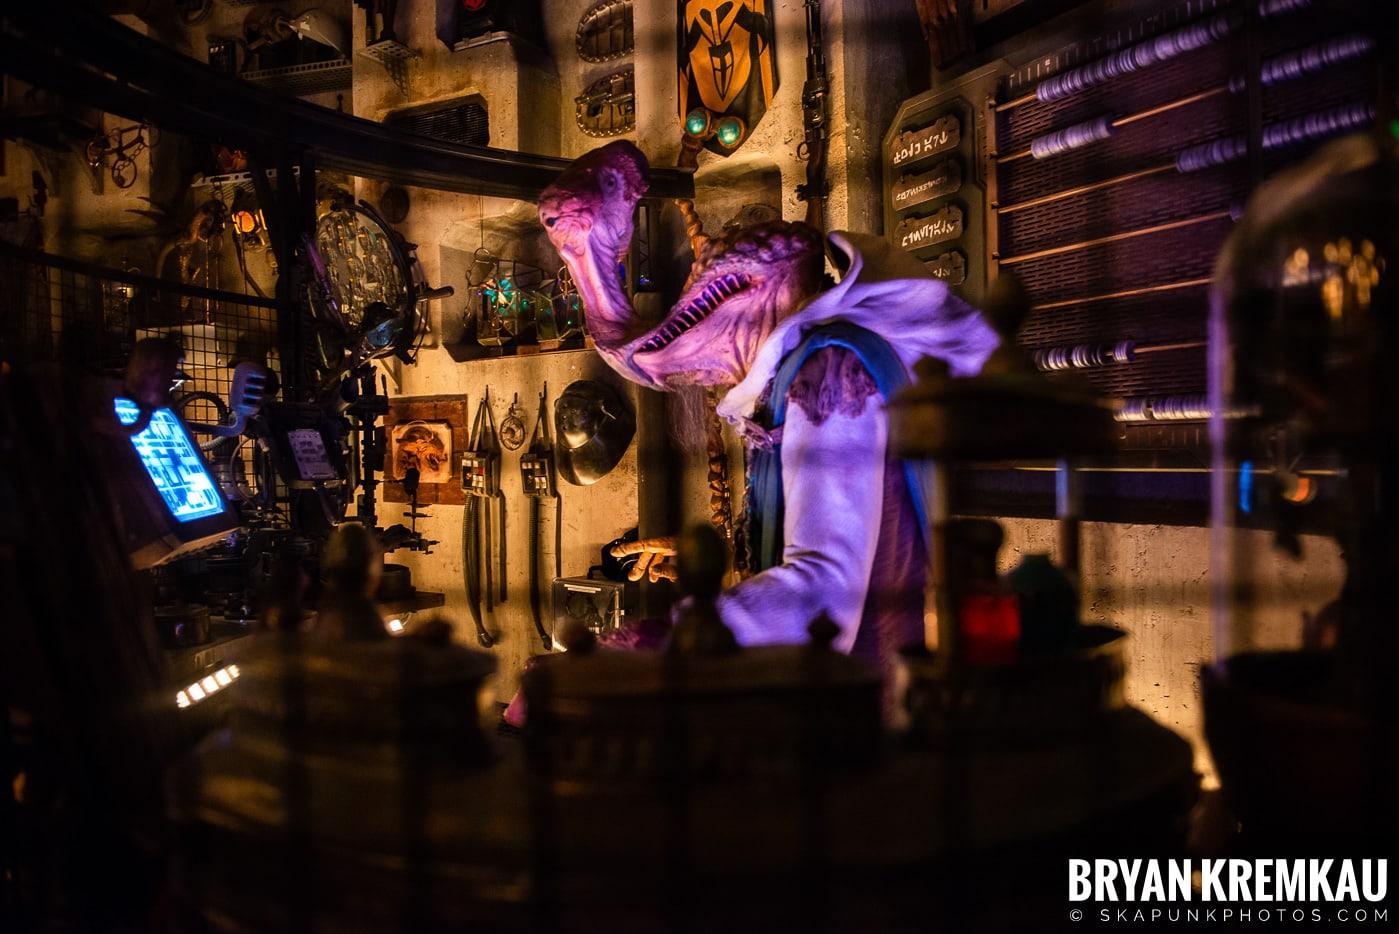 Walt Disney World Vacation: Day 5 (Animal Kingdom / Disney's Hollywood Studios) - 10.3.19 (25)